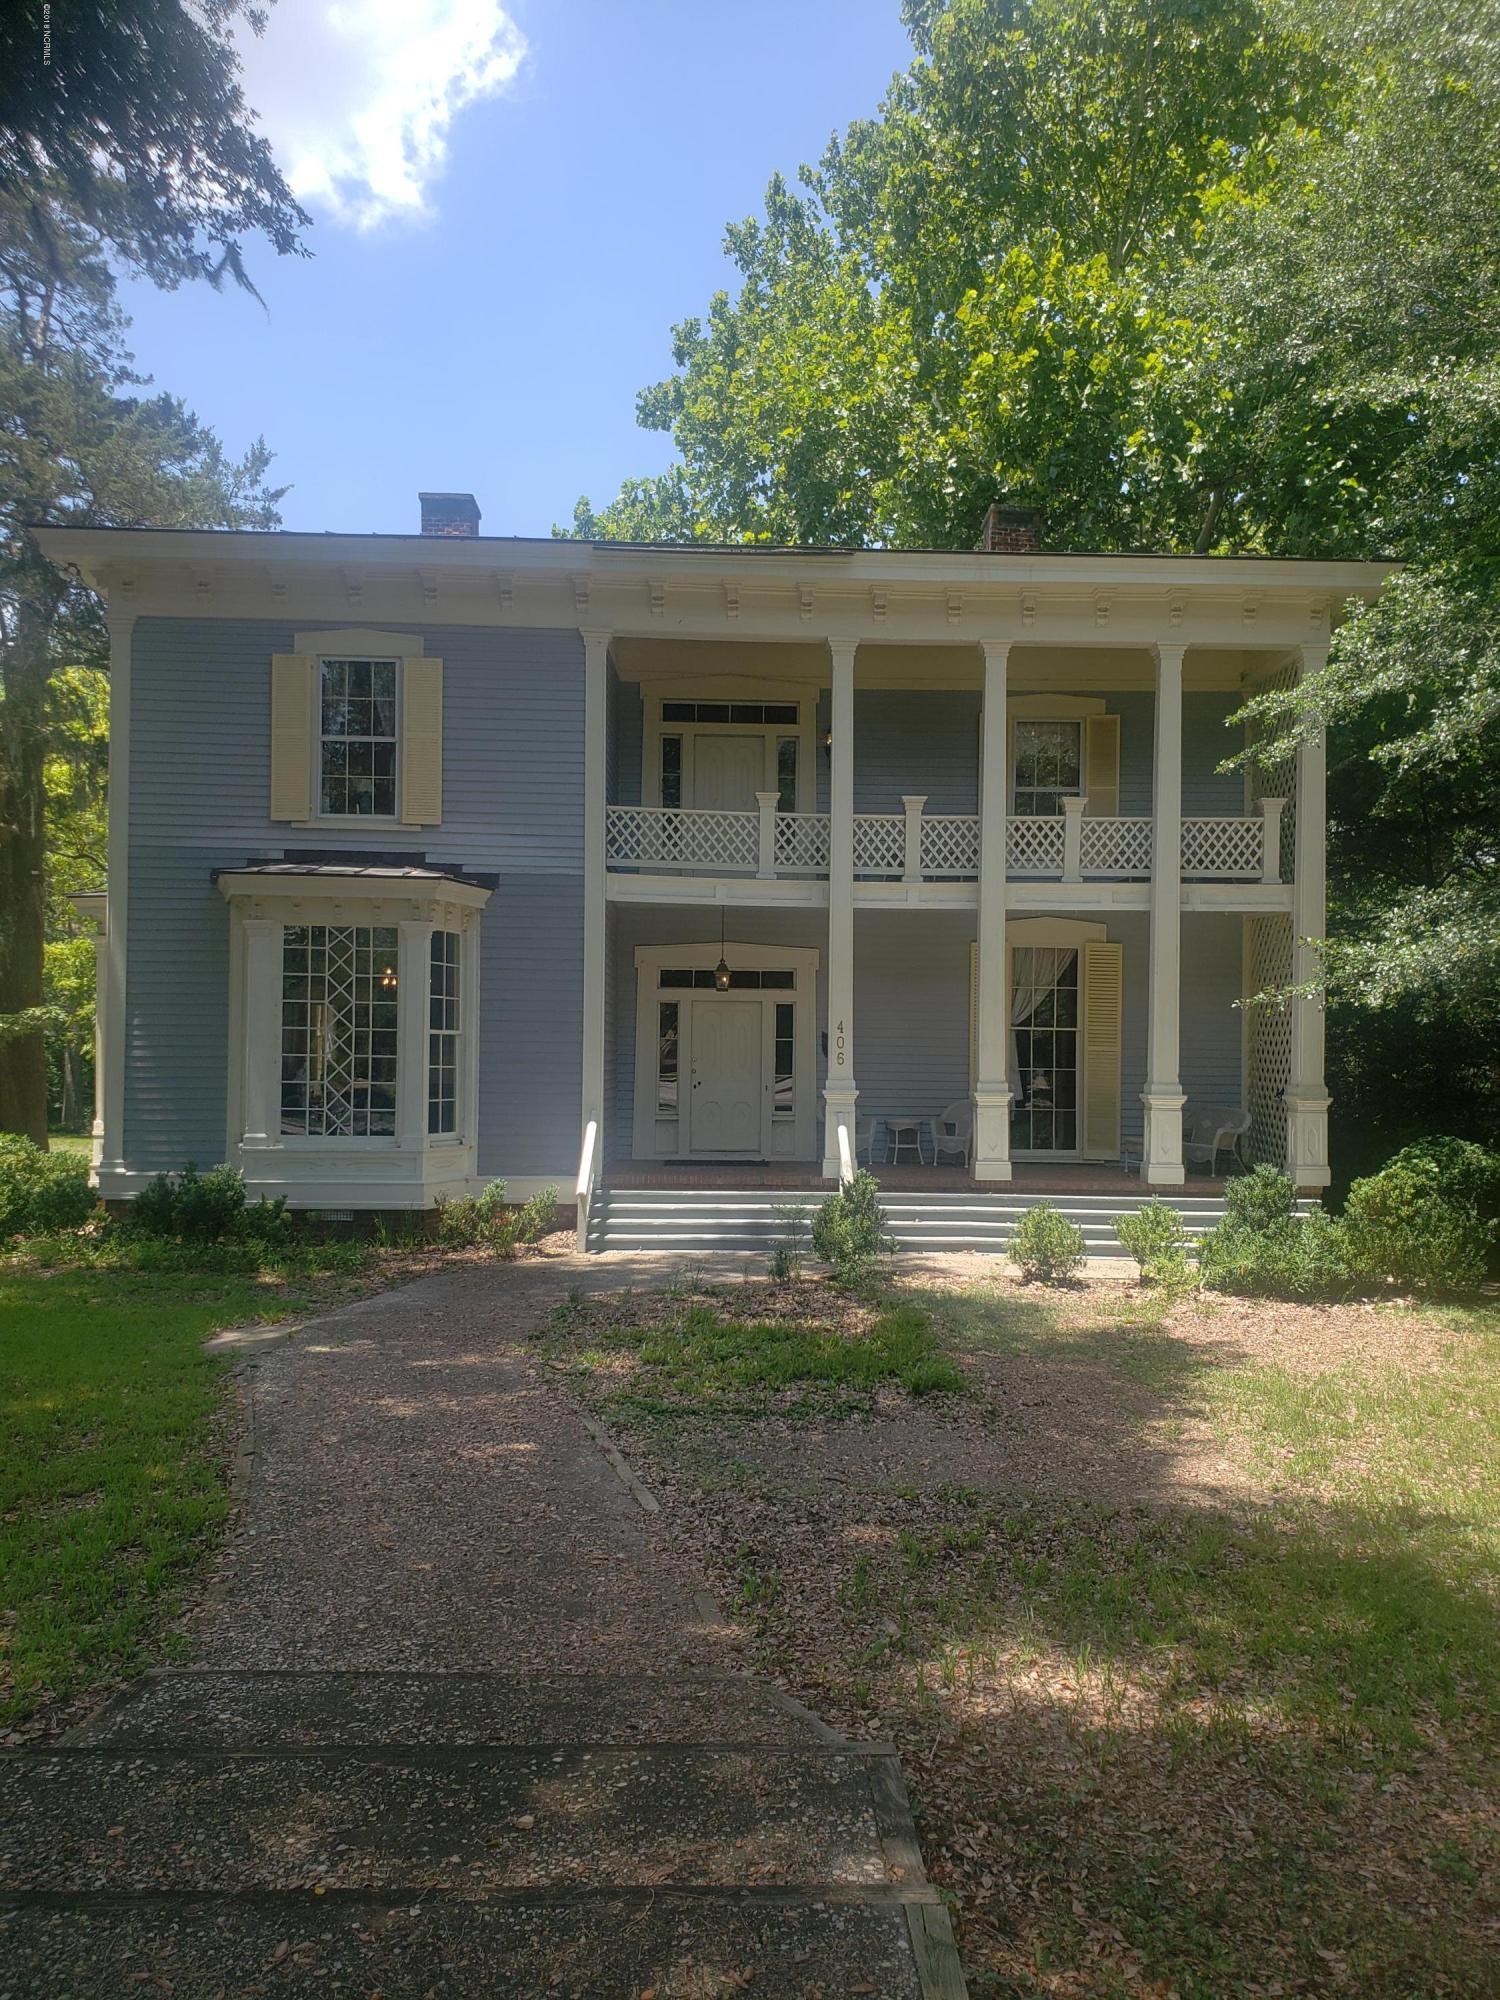 406 Main Street, Kenansville, North Carolina, 5 Bedrooms Bedrooms, 10 Rooms Rooms,4 BathroomsBathrooms,Single family residence,For sale,Main,100117230